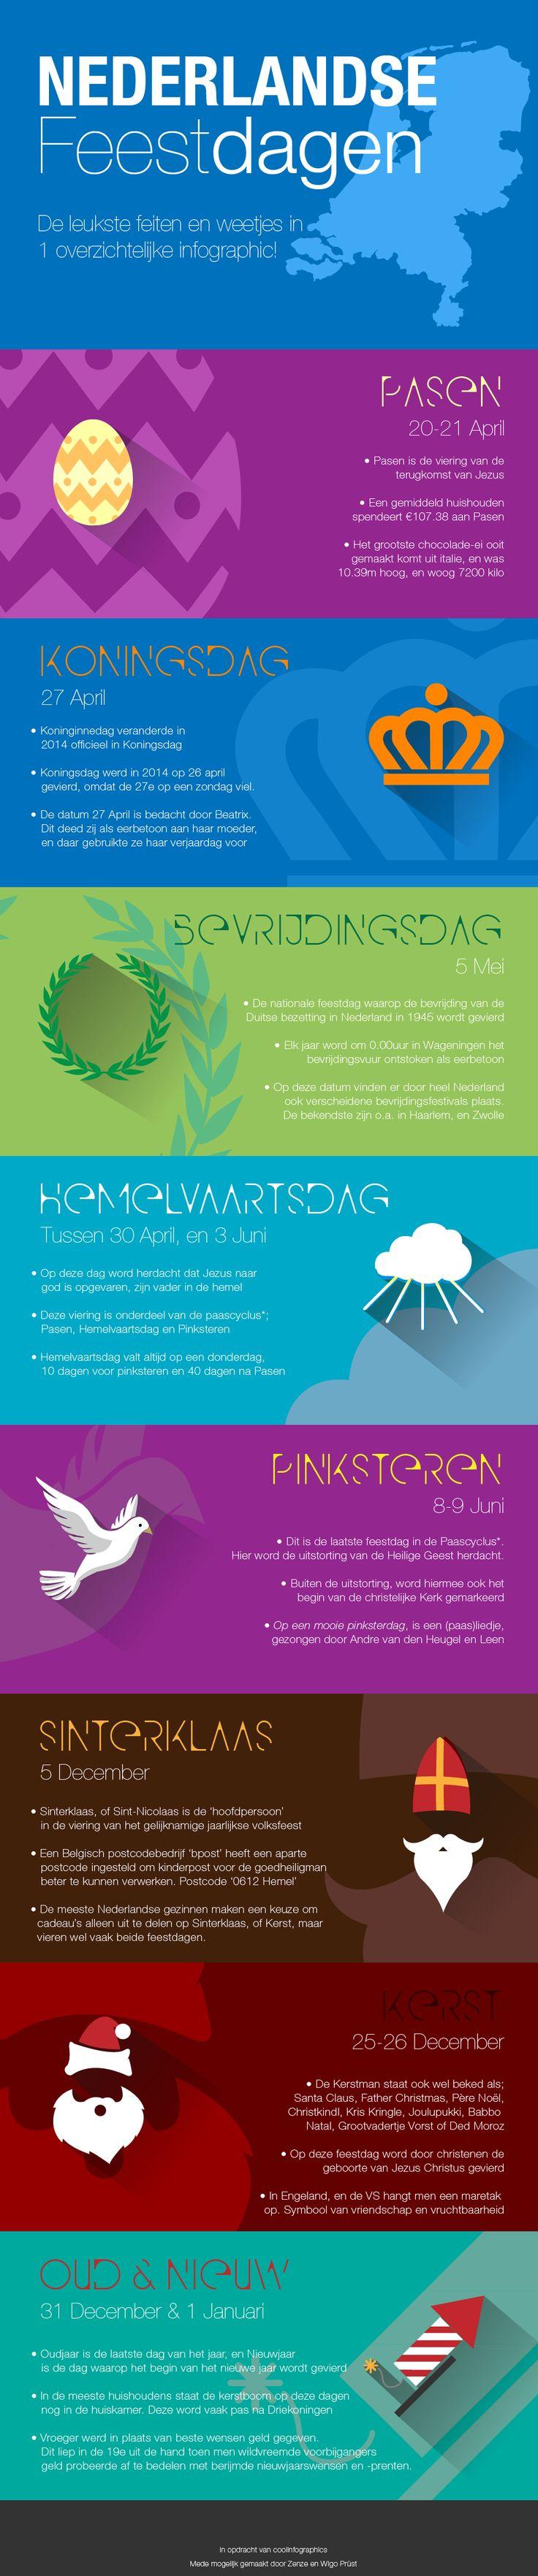 17 beste afbeeldingen over nederland op Pinterest - Anne frank ...